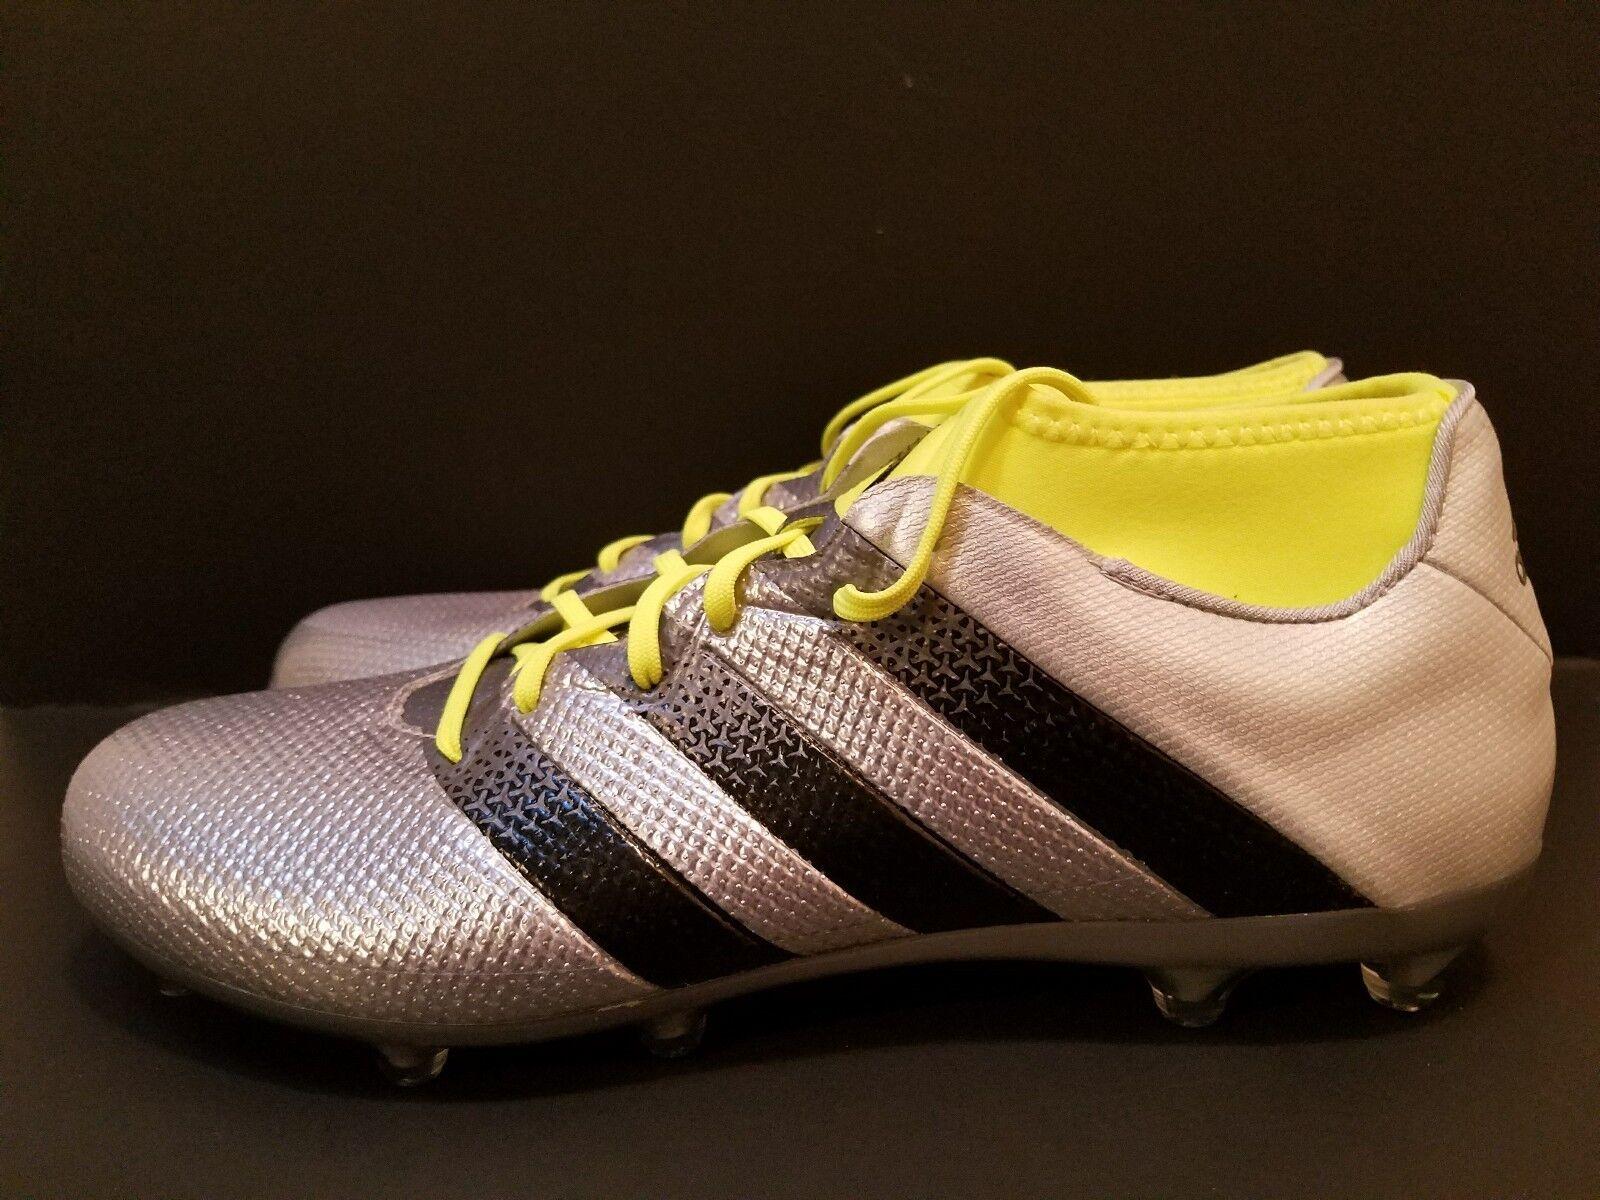 neue adidas ace 16,2 primemesh fg mens / ag sz 11 mens fg stollenschuhe silber aq3448 615432